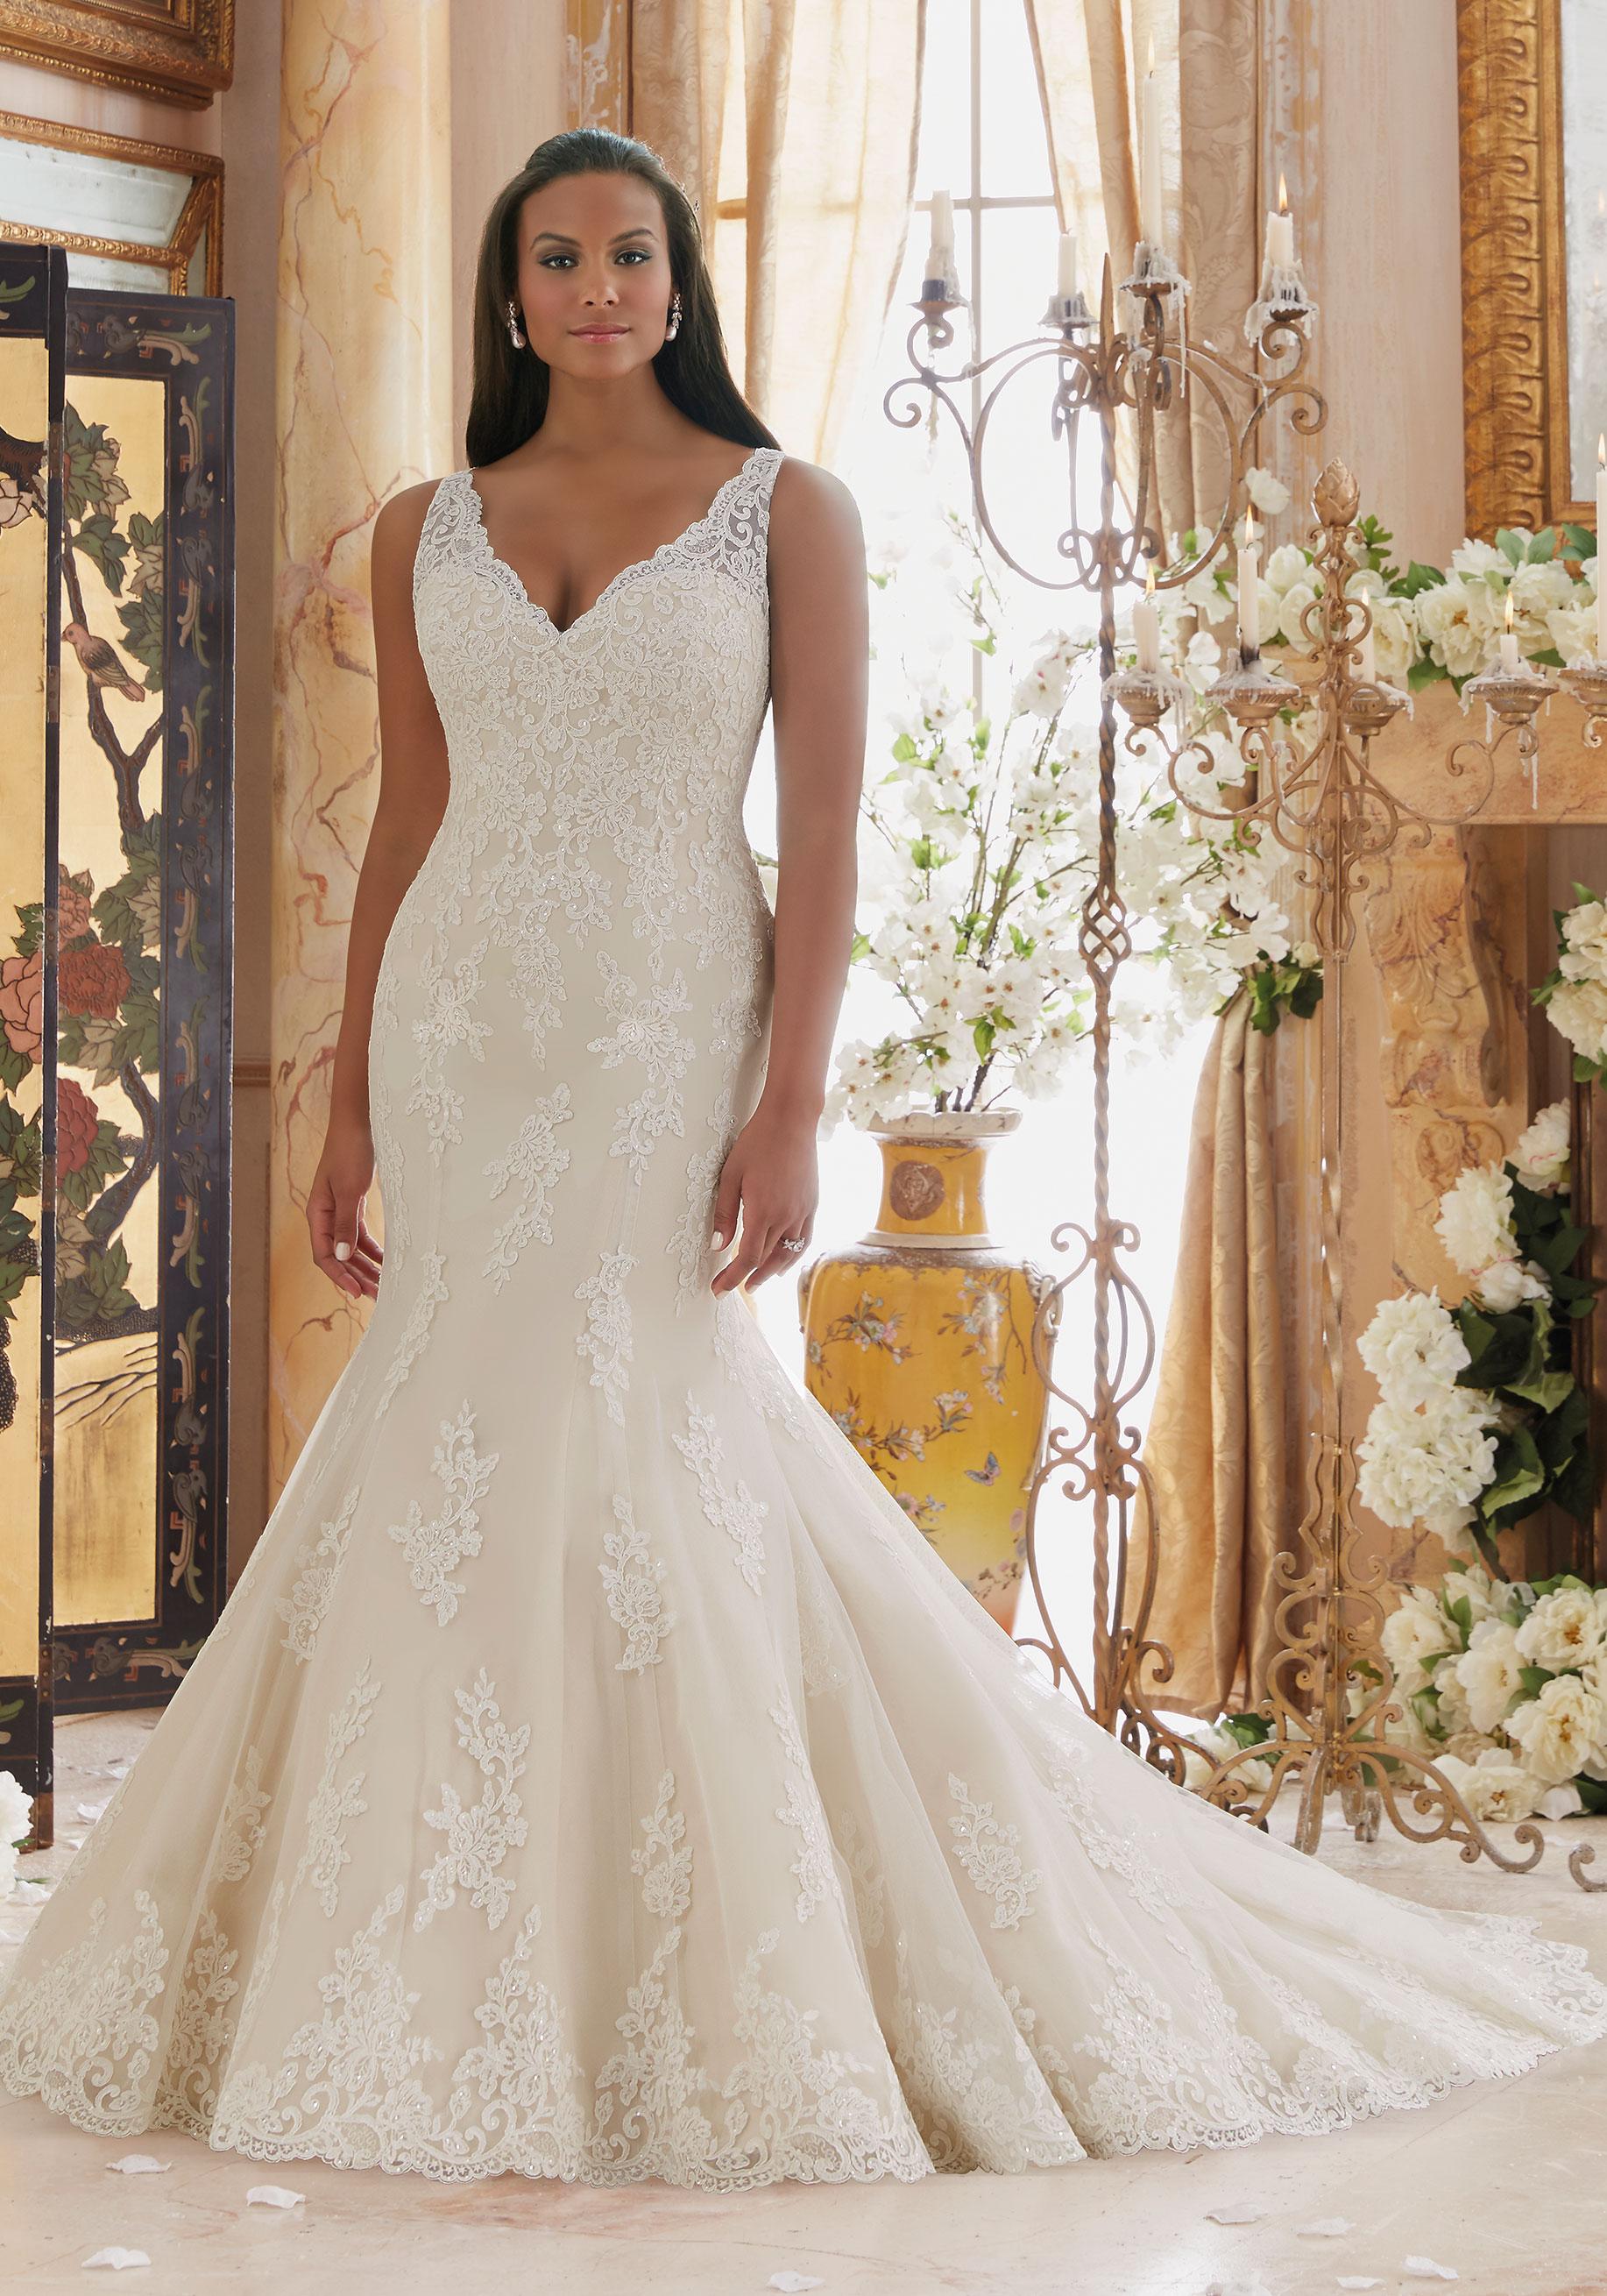 mori lee plus size wedding dresses photo - 1